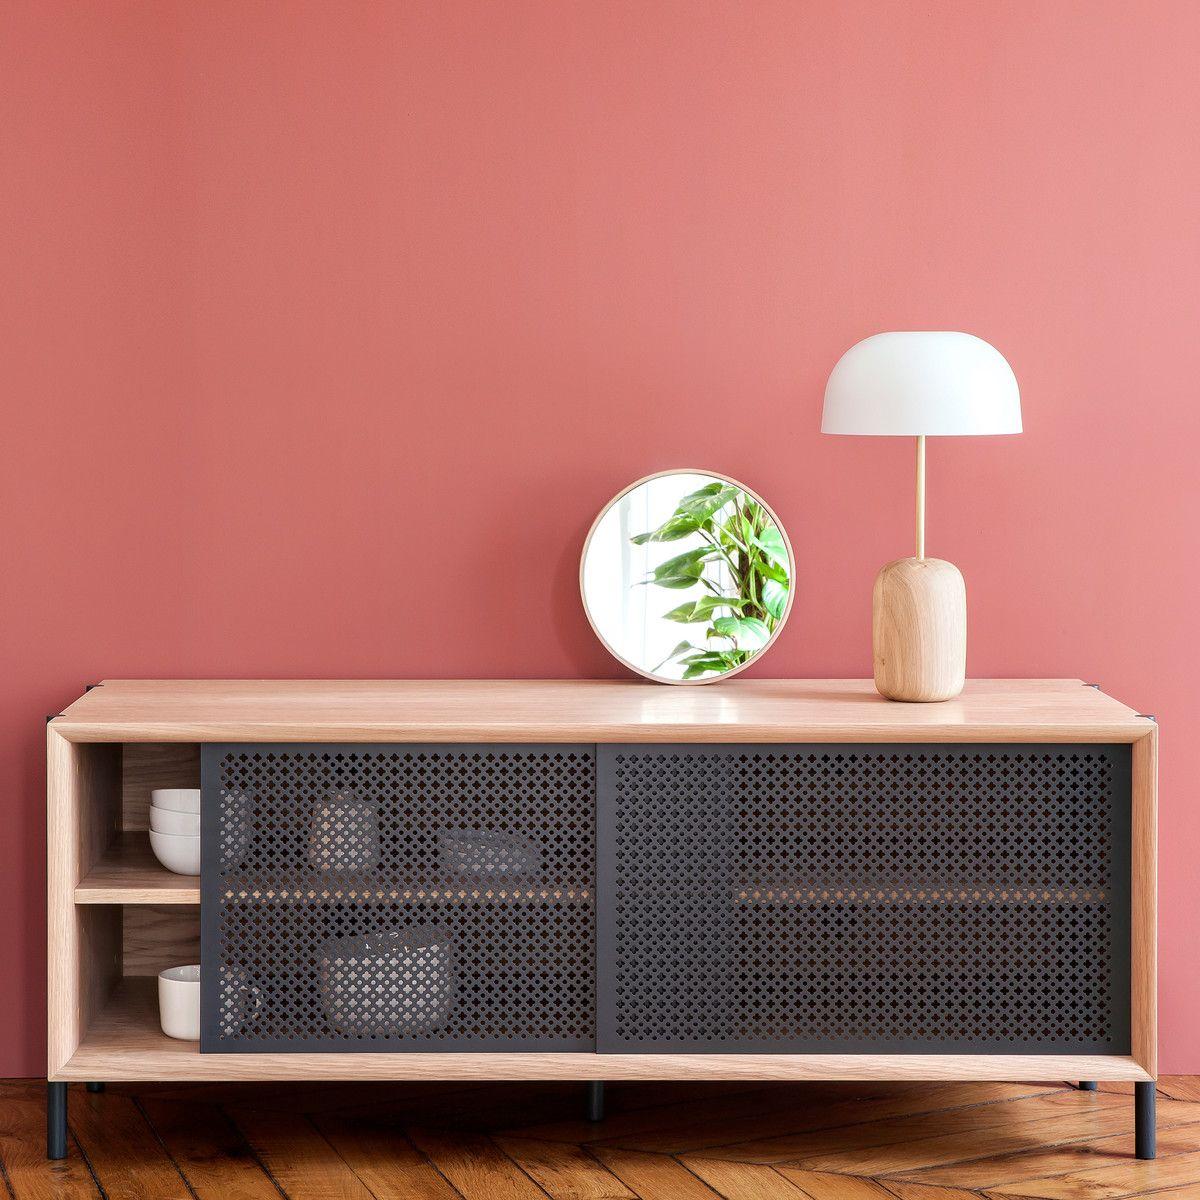 gabin sideboard cmhartô   connox   rustikale möbel